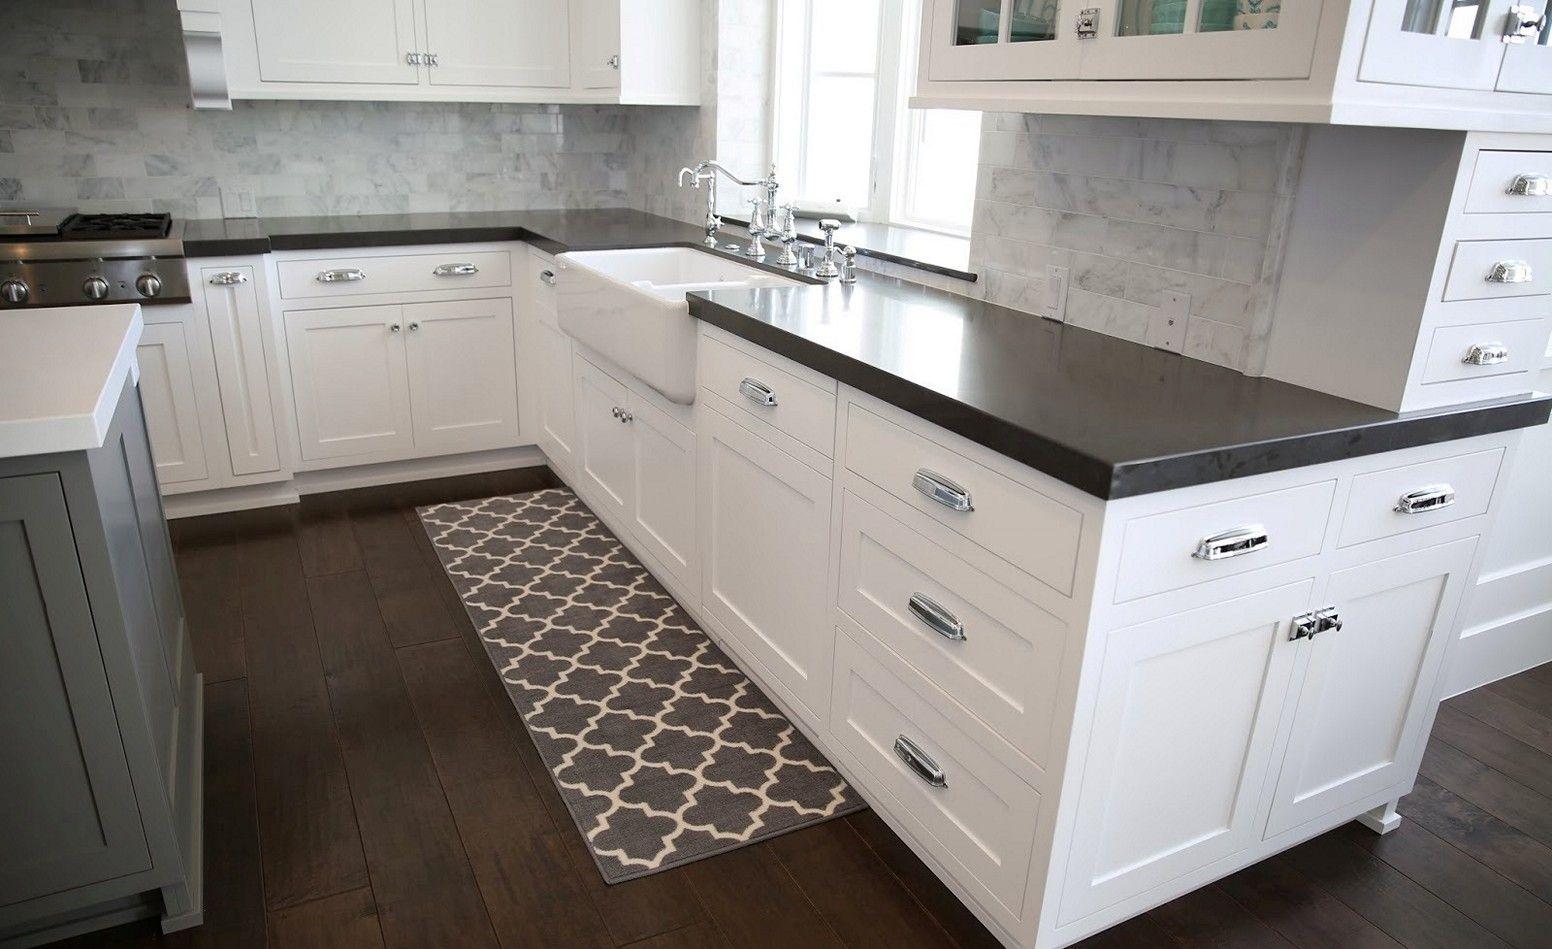 Image result for kitchen rug | Kitchen rug, Kitchen flooring ...